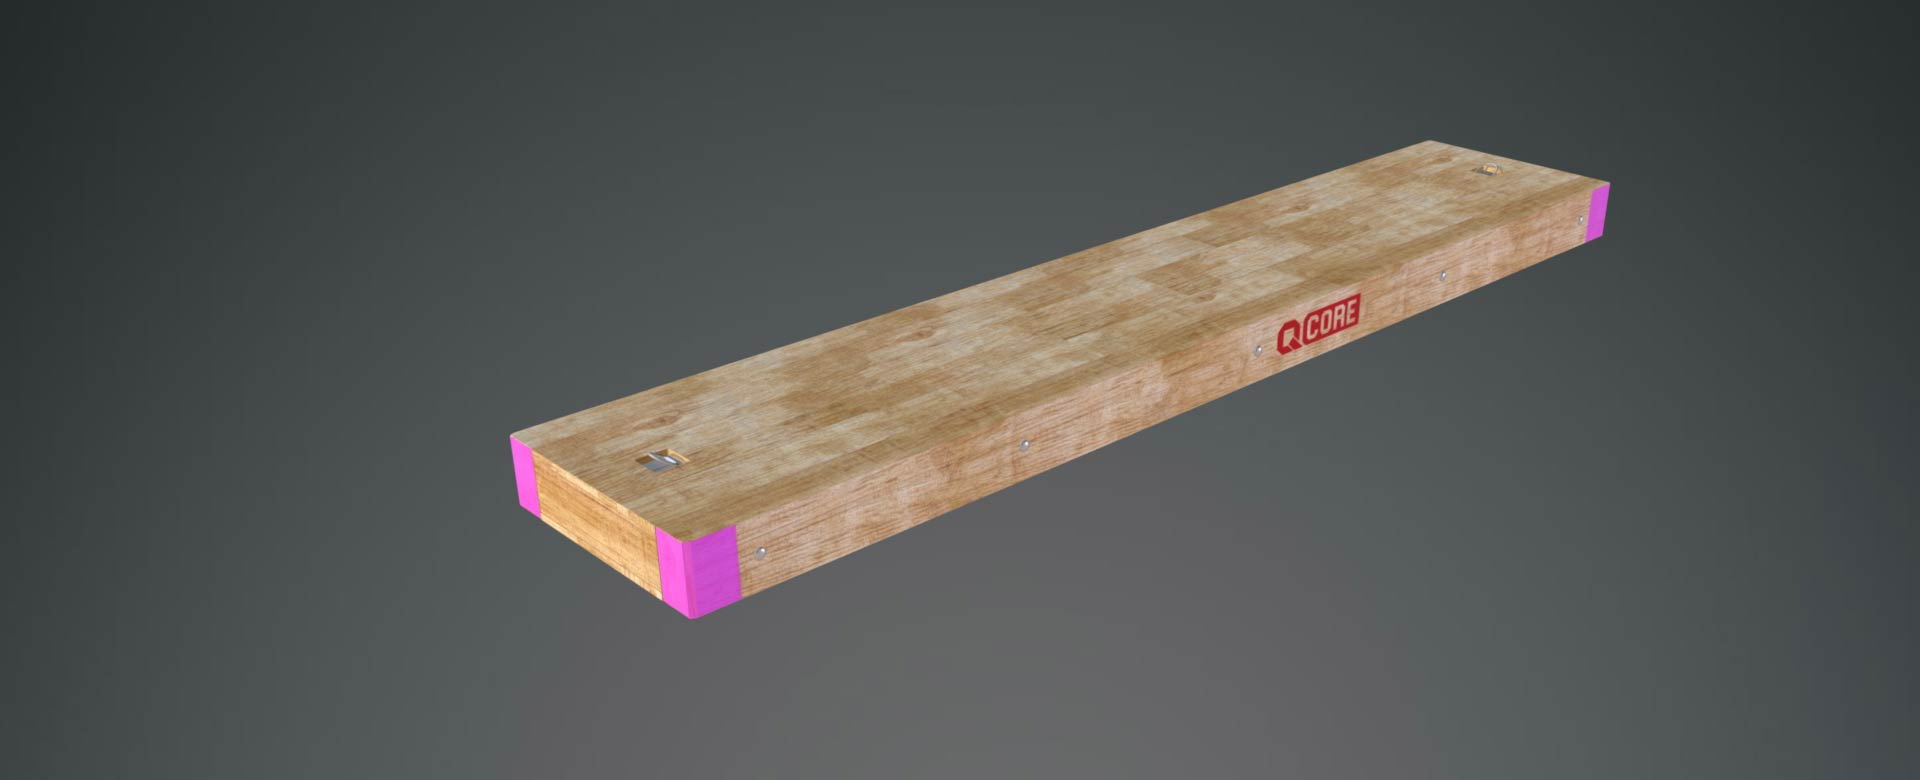 Largest Crane Oilfield Custom Mat Producer Quality Mat